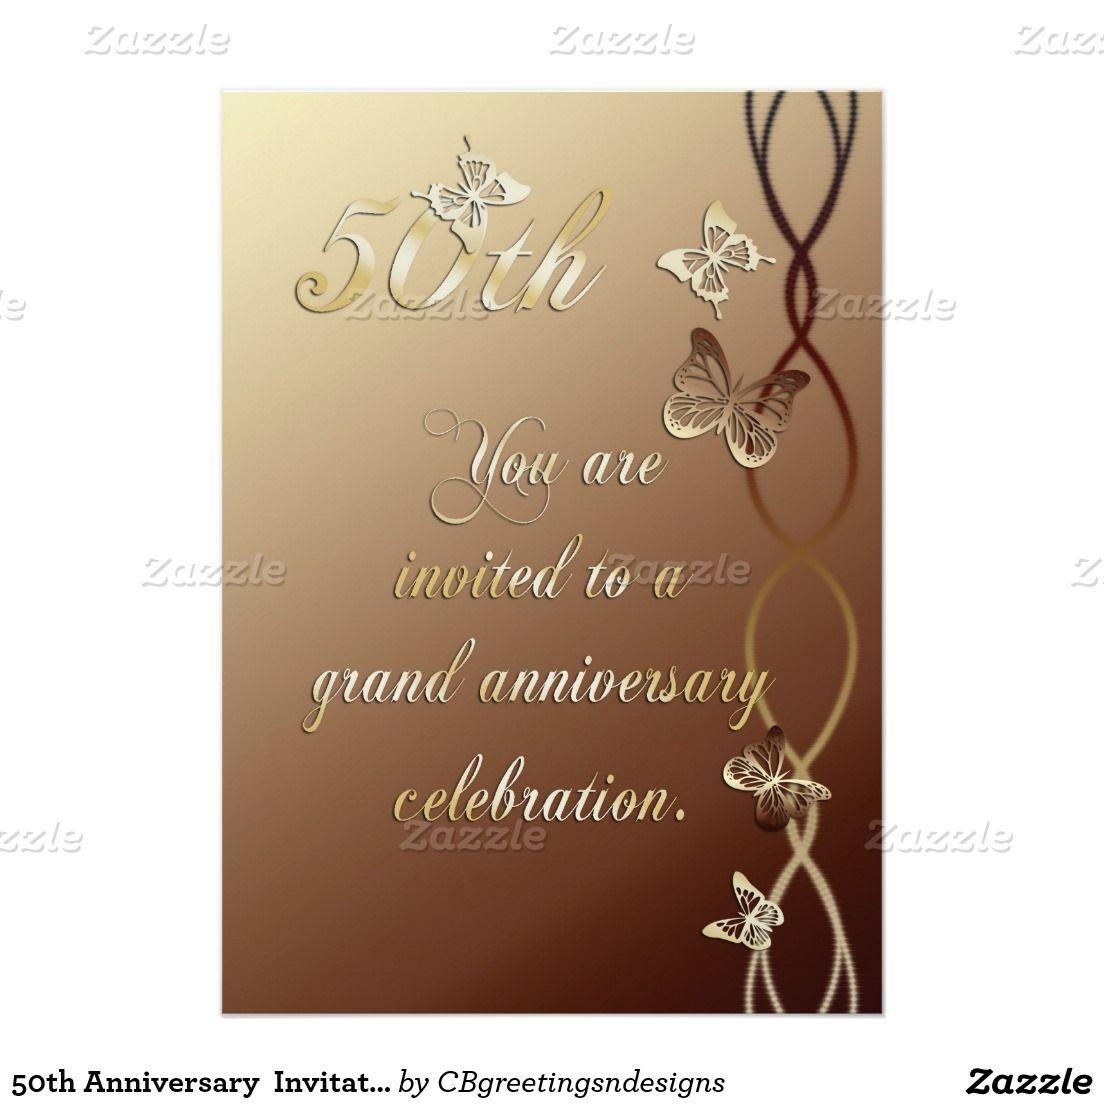 50th Anniversary Invitation 50th Anniversary Invitations